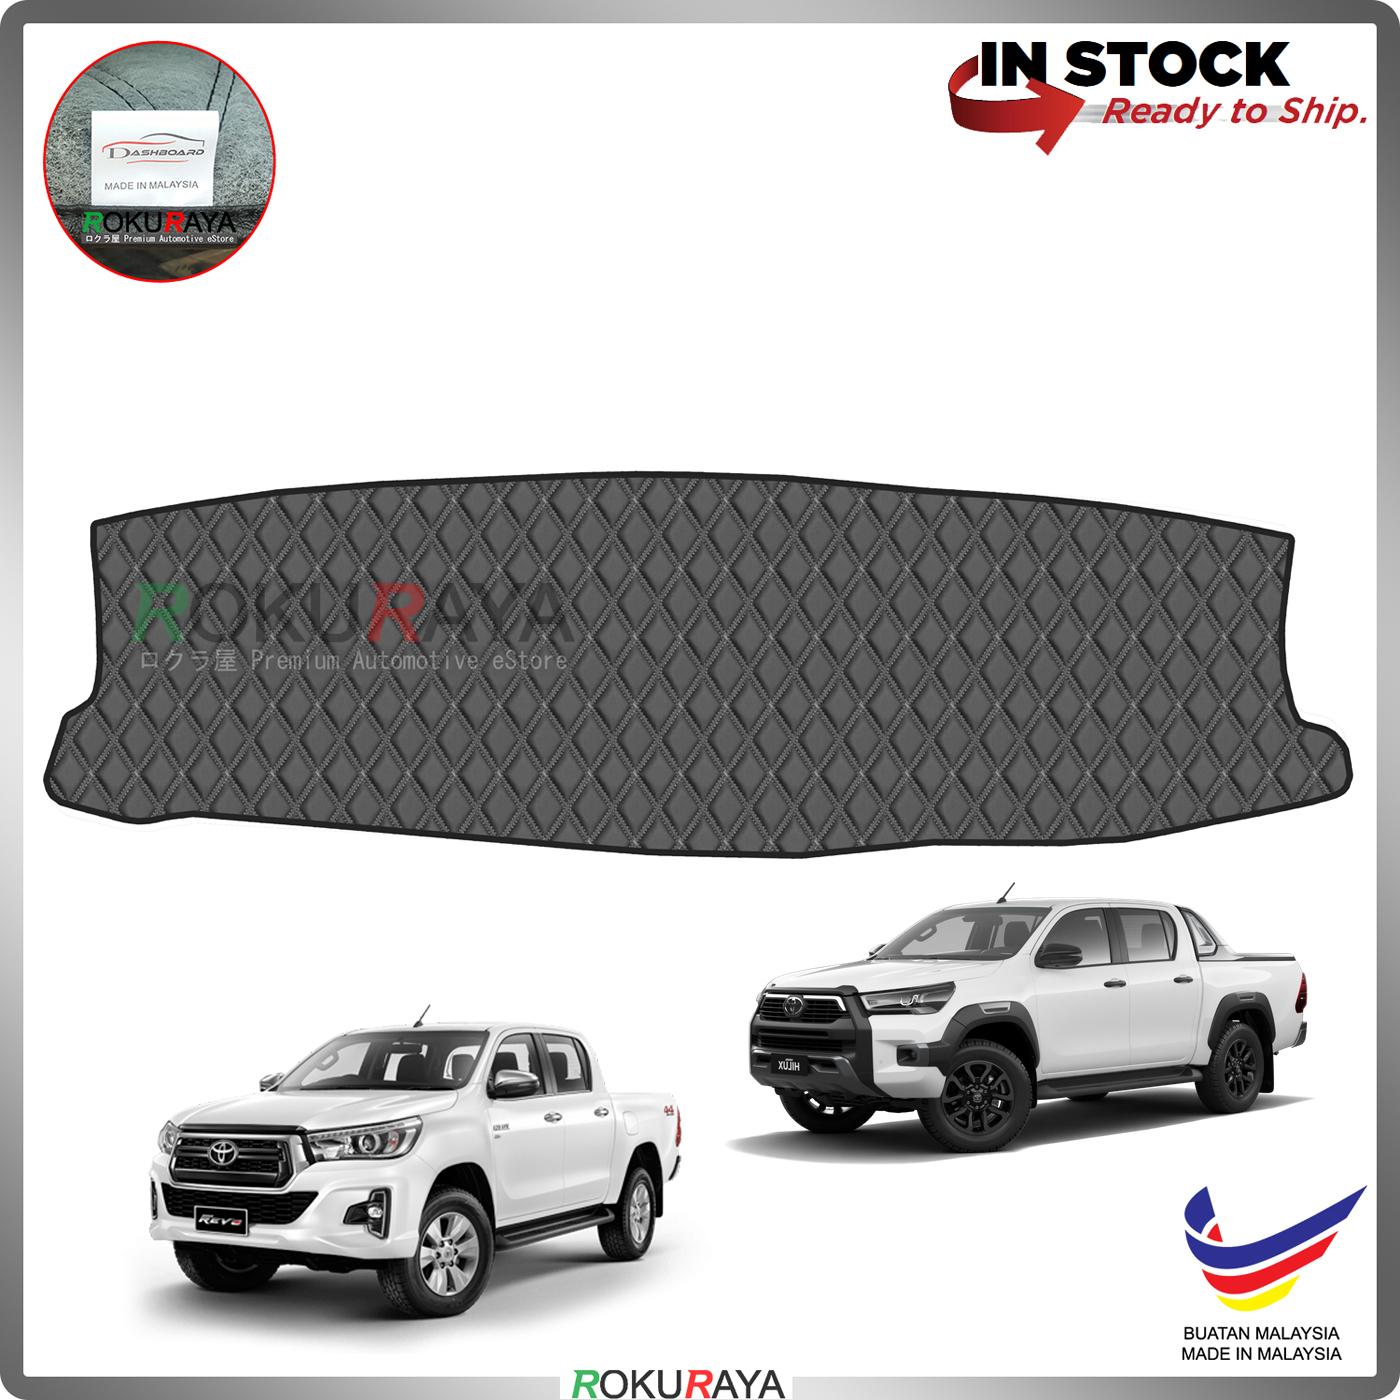 [BLACK LINE] Toyota Hilux Revo Rogue Rocco New RR Dashboard Cover Leather PU PVC Black Car Accessories Parts